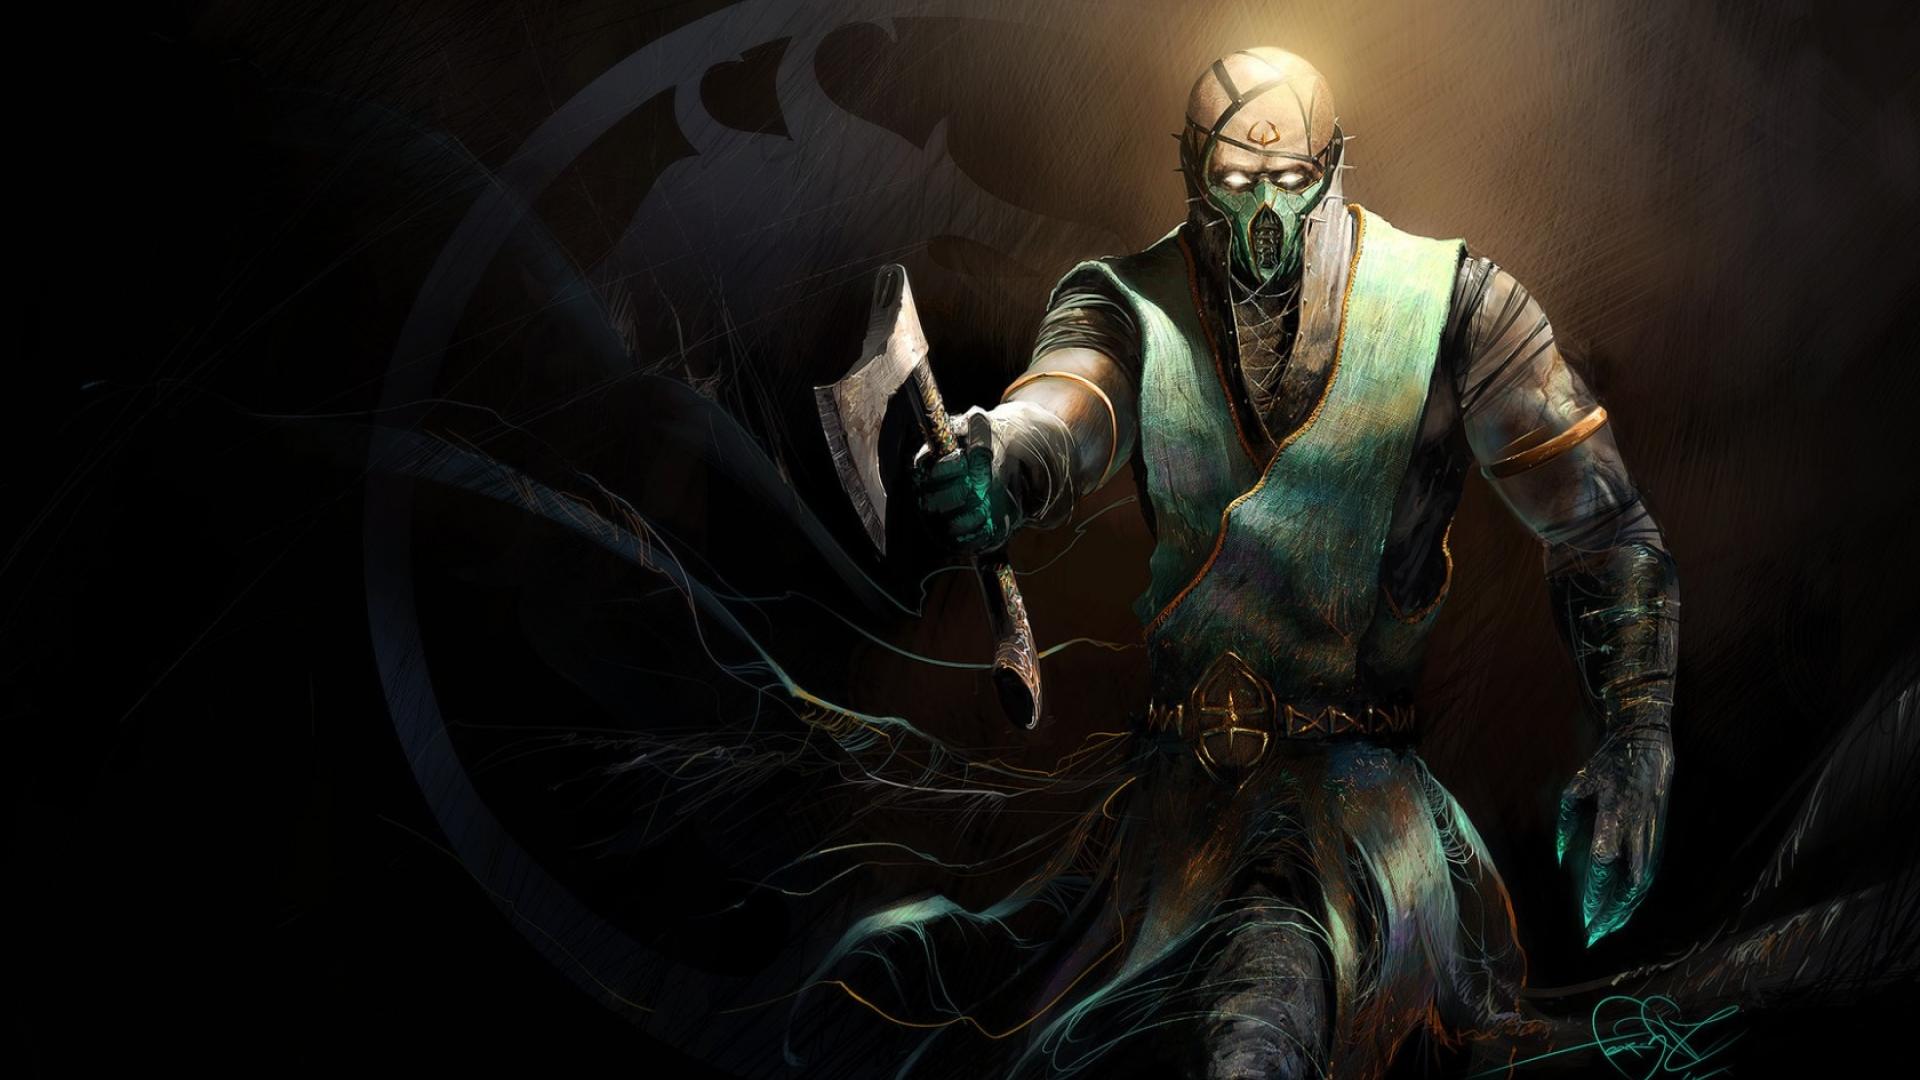 1920x1080 Mortal Kombat X Chameleon Art 1080p Laptop Full Hd